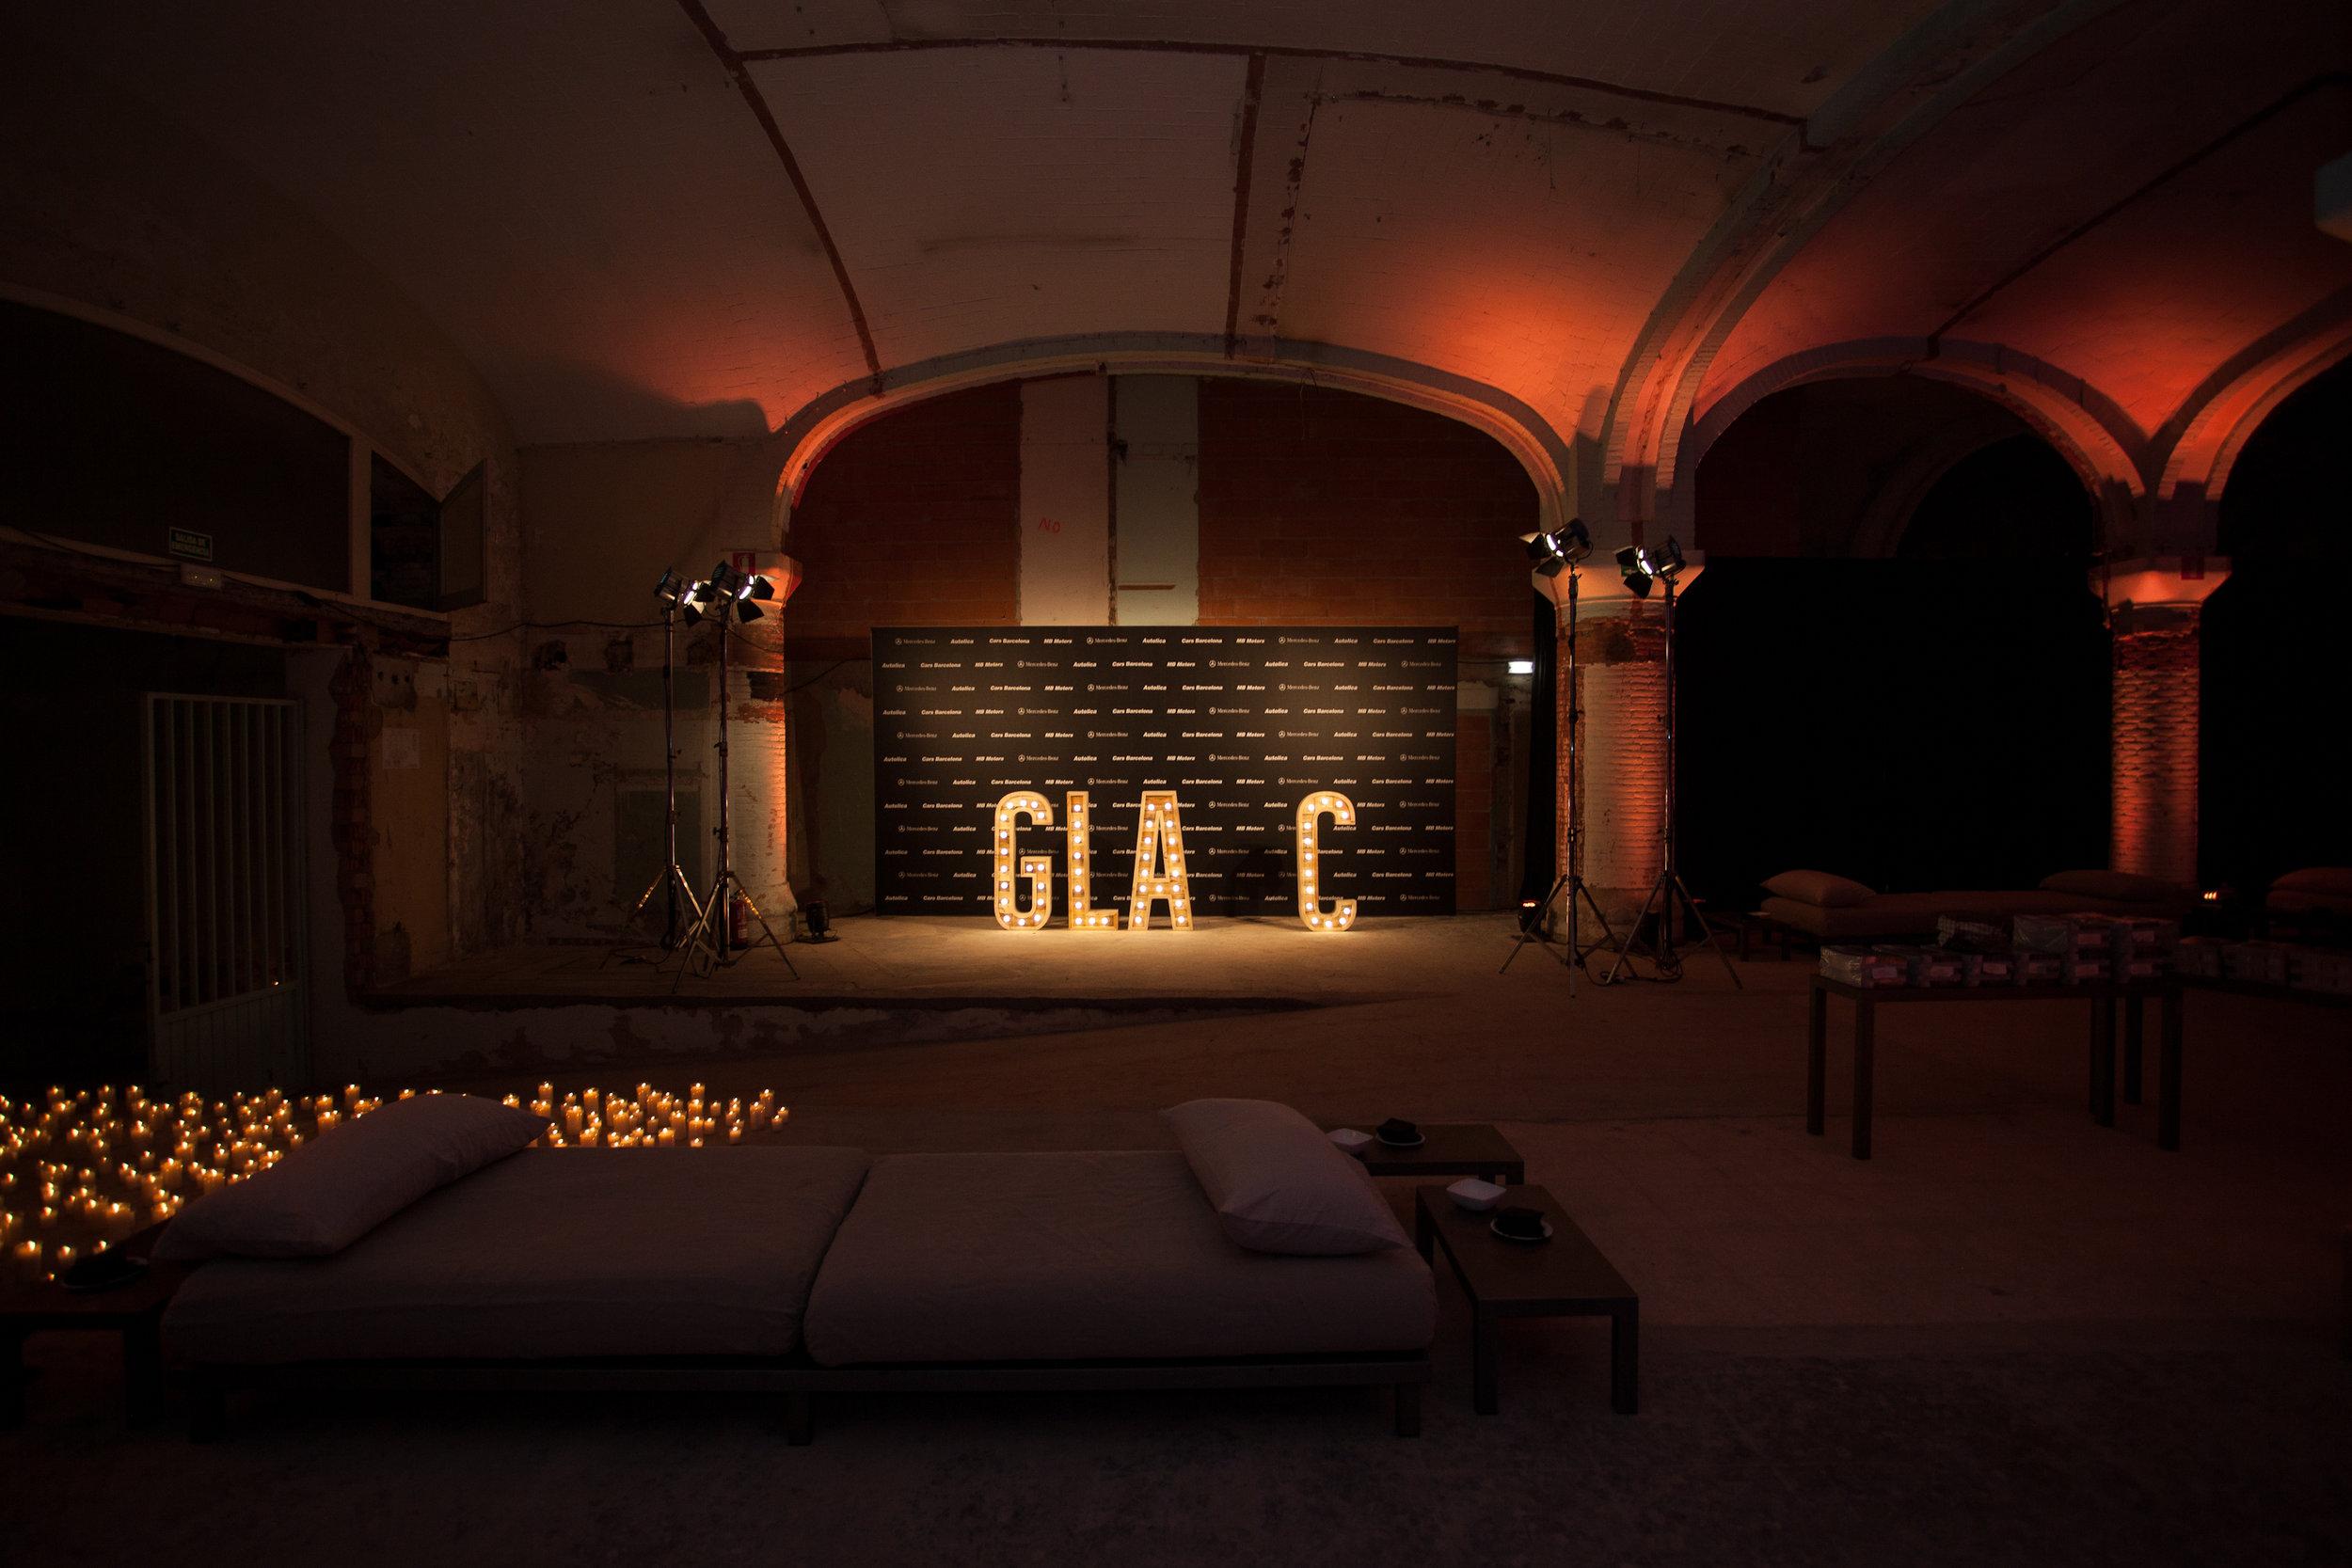 alquiler-letras-luminosas-27lletres-GLA.JPG